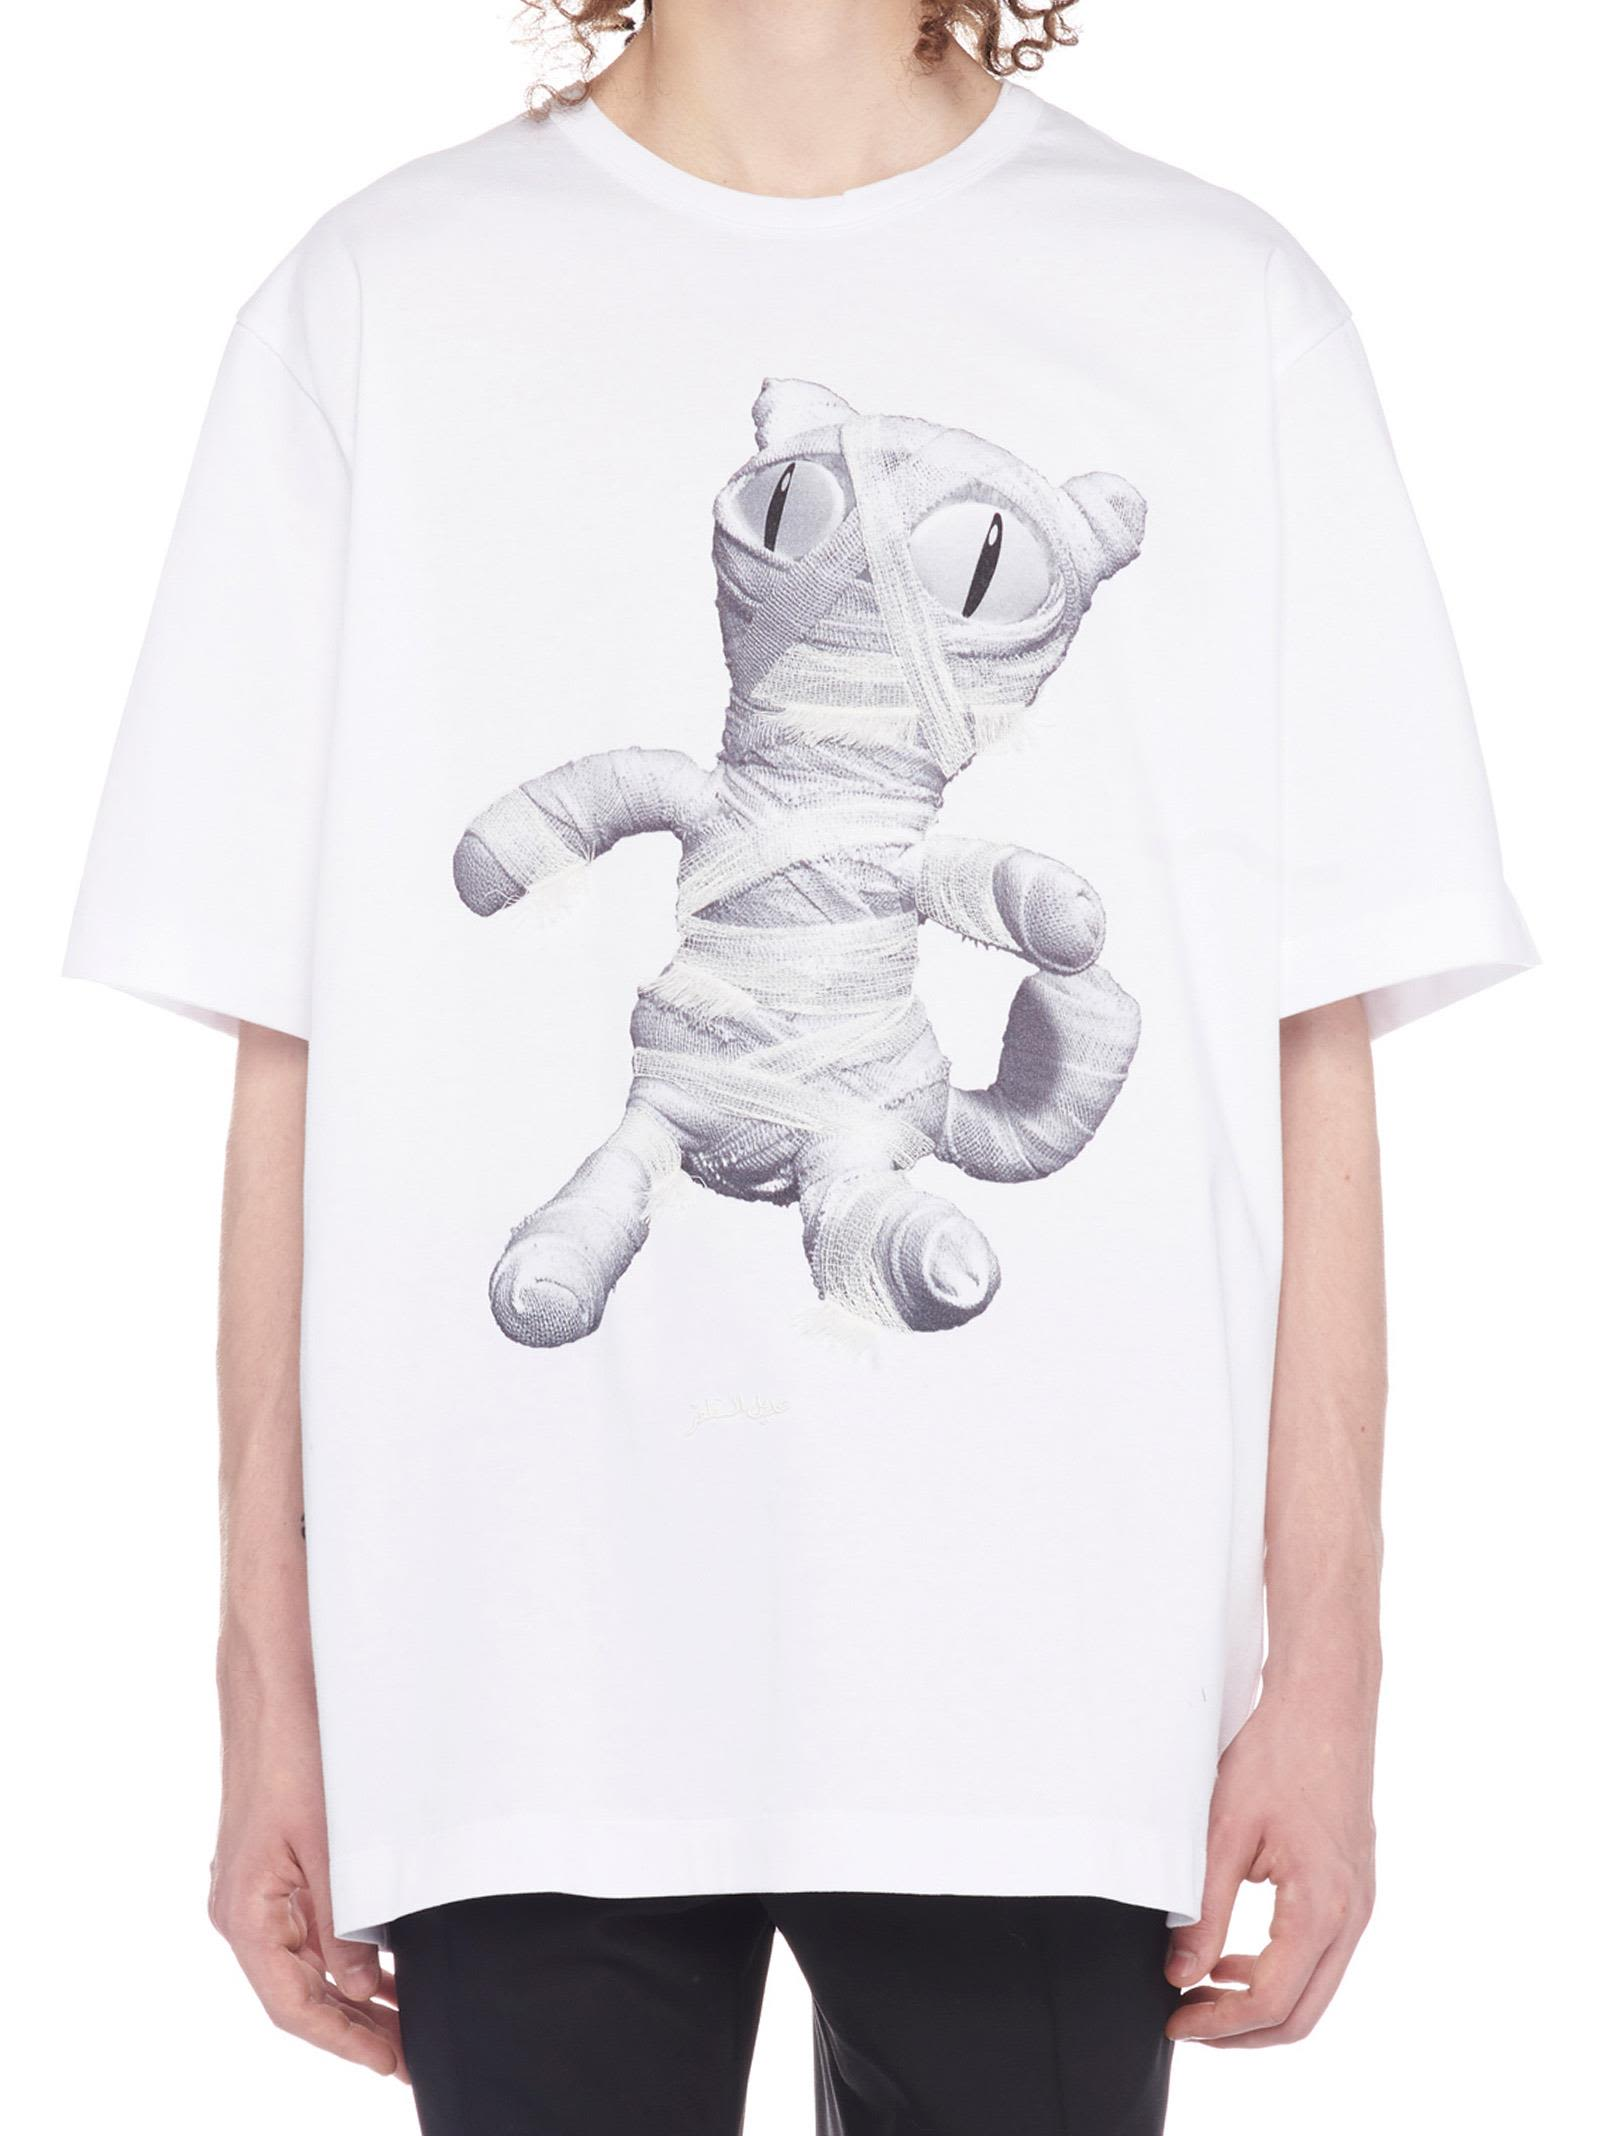 Juun.j 'mummy Cat' T-shirt